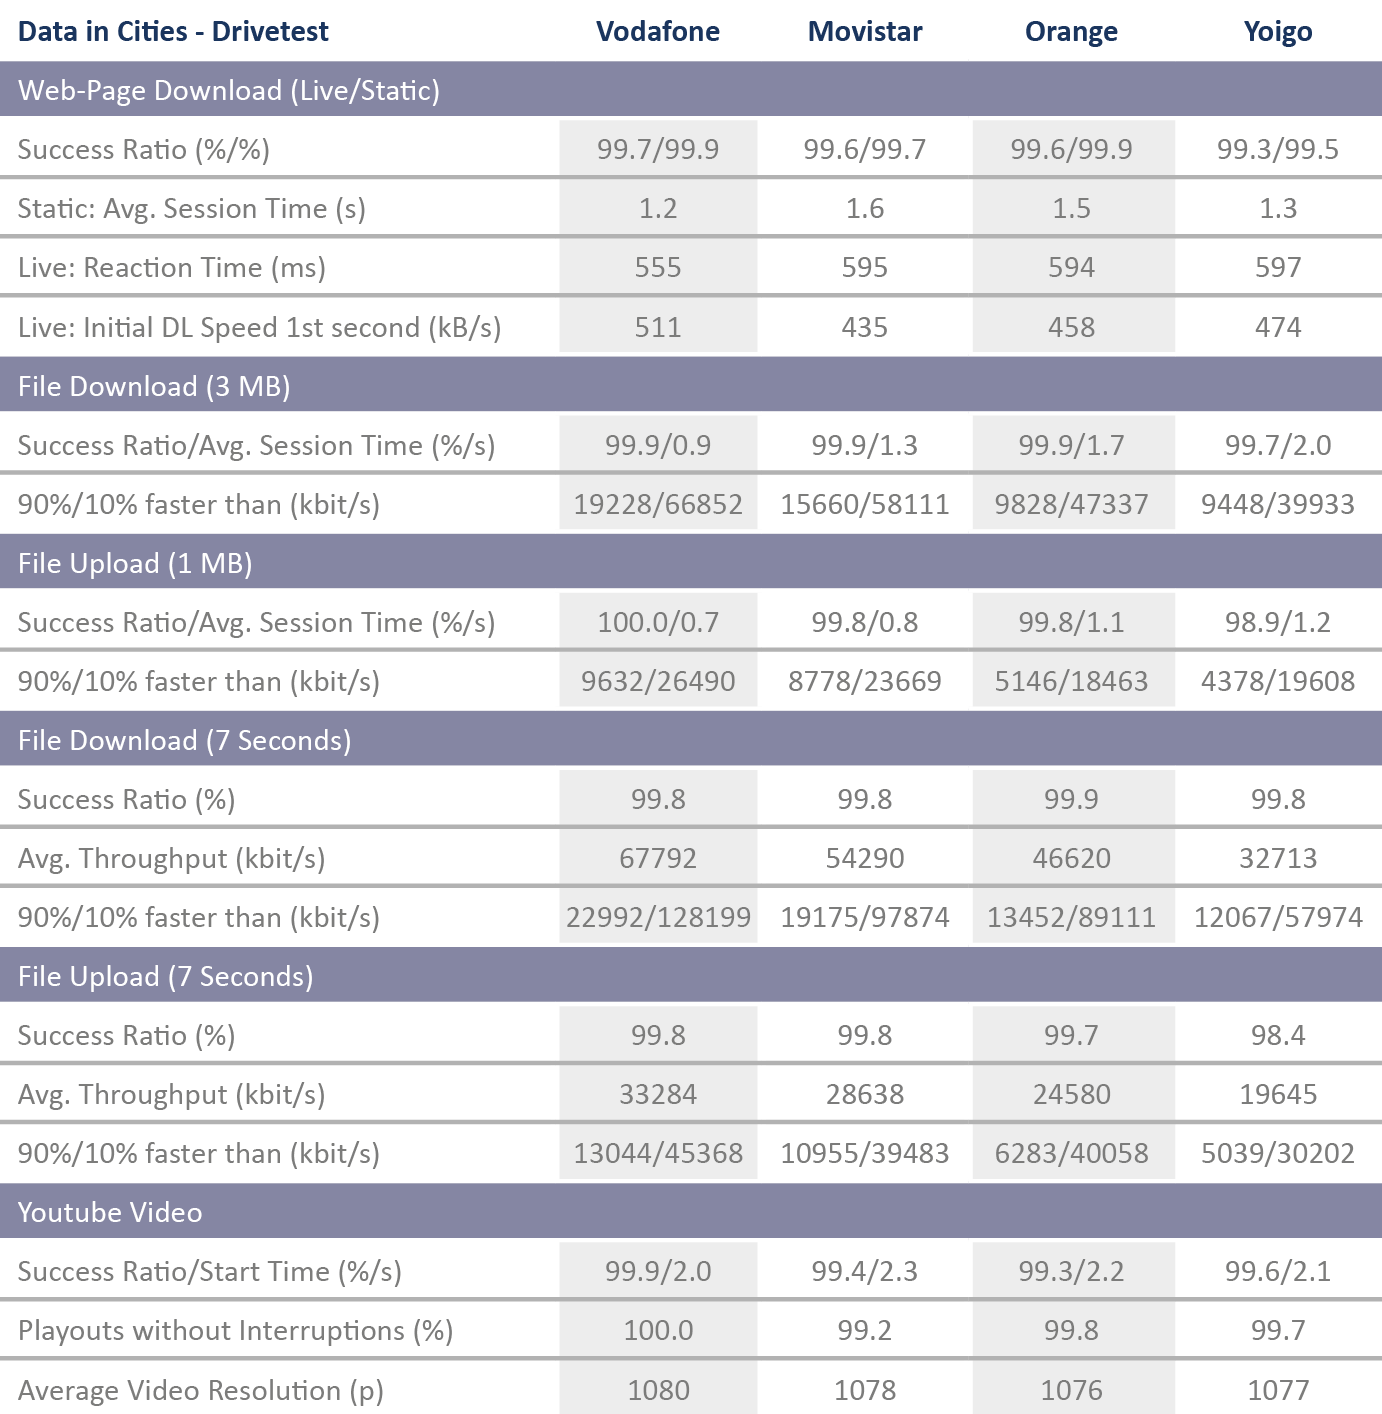 ES_Tabelle_DataCities_Drivetest_2017_Englisch.png